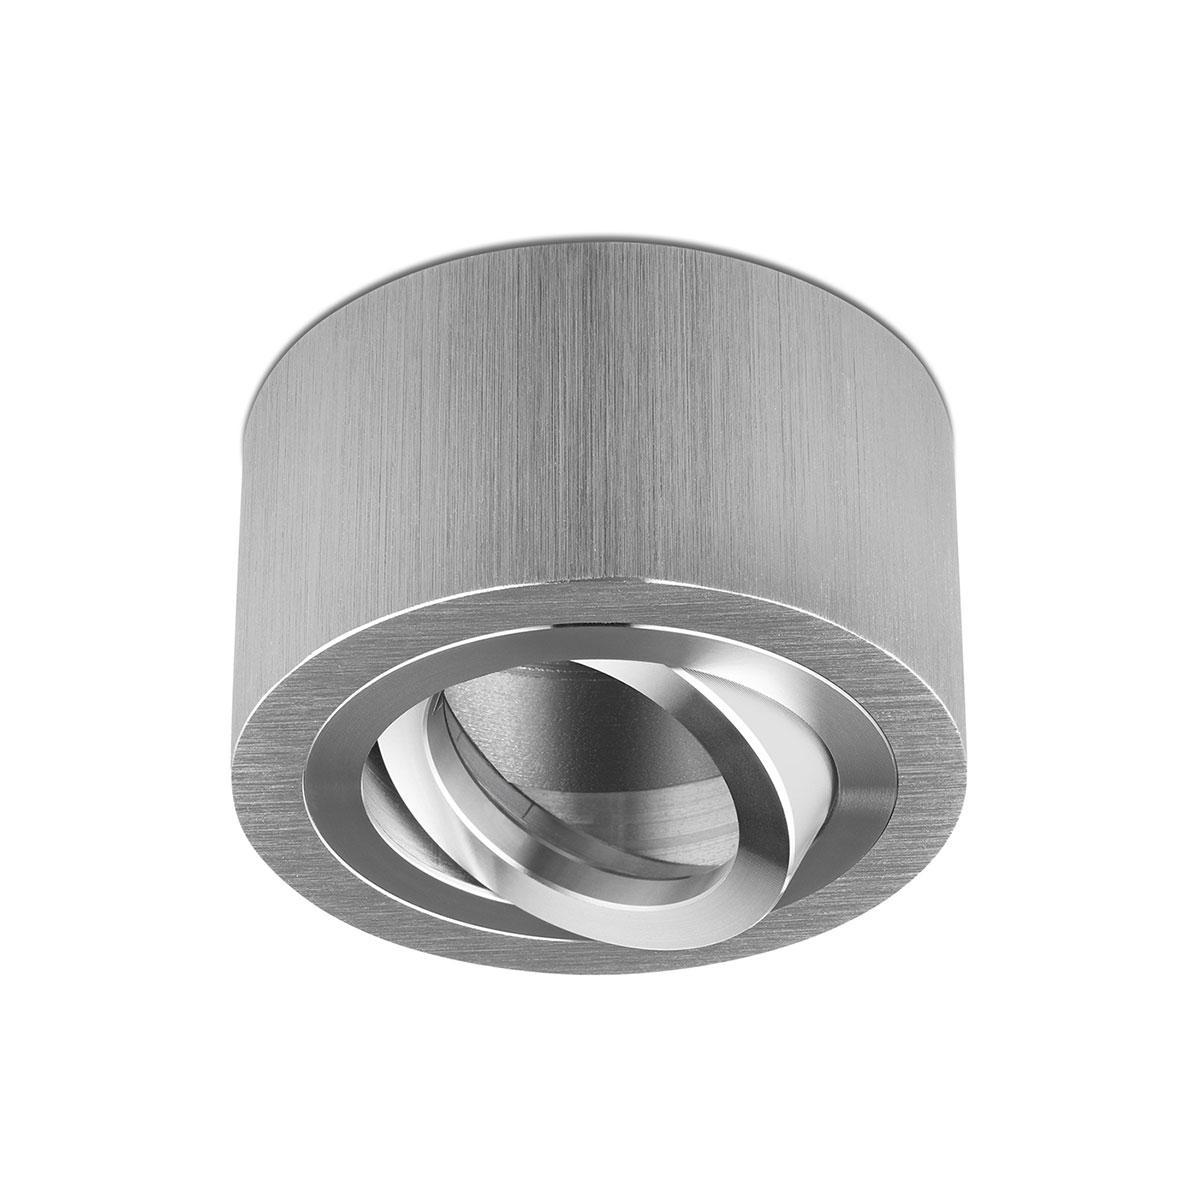 Flacher Aufbaustrahler, silber gebürstet, runde Form - Abdeckring: silber - LED Modul: ohne